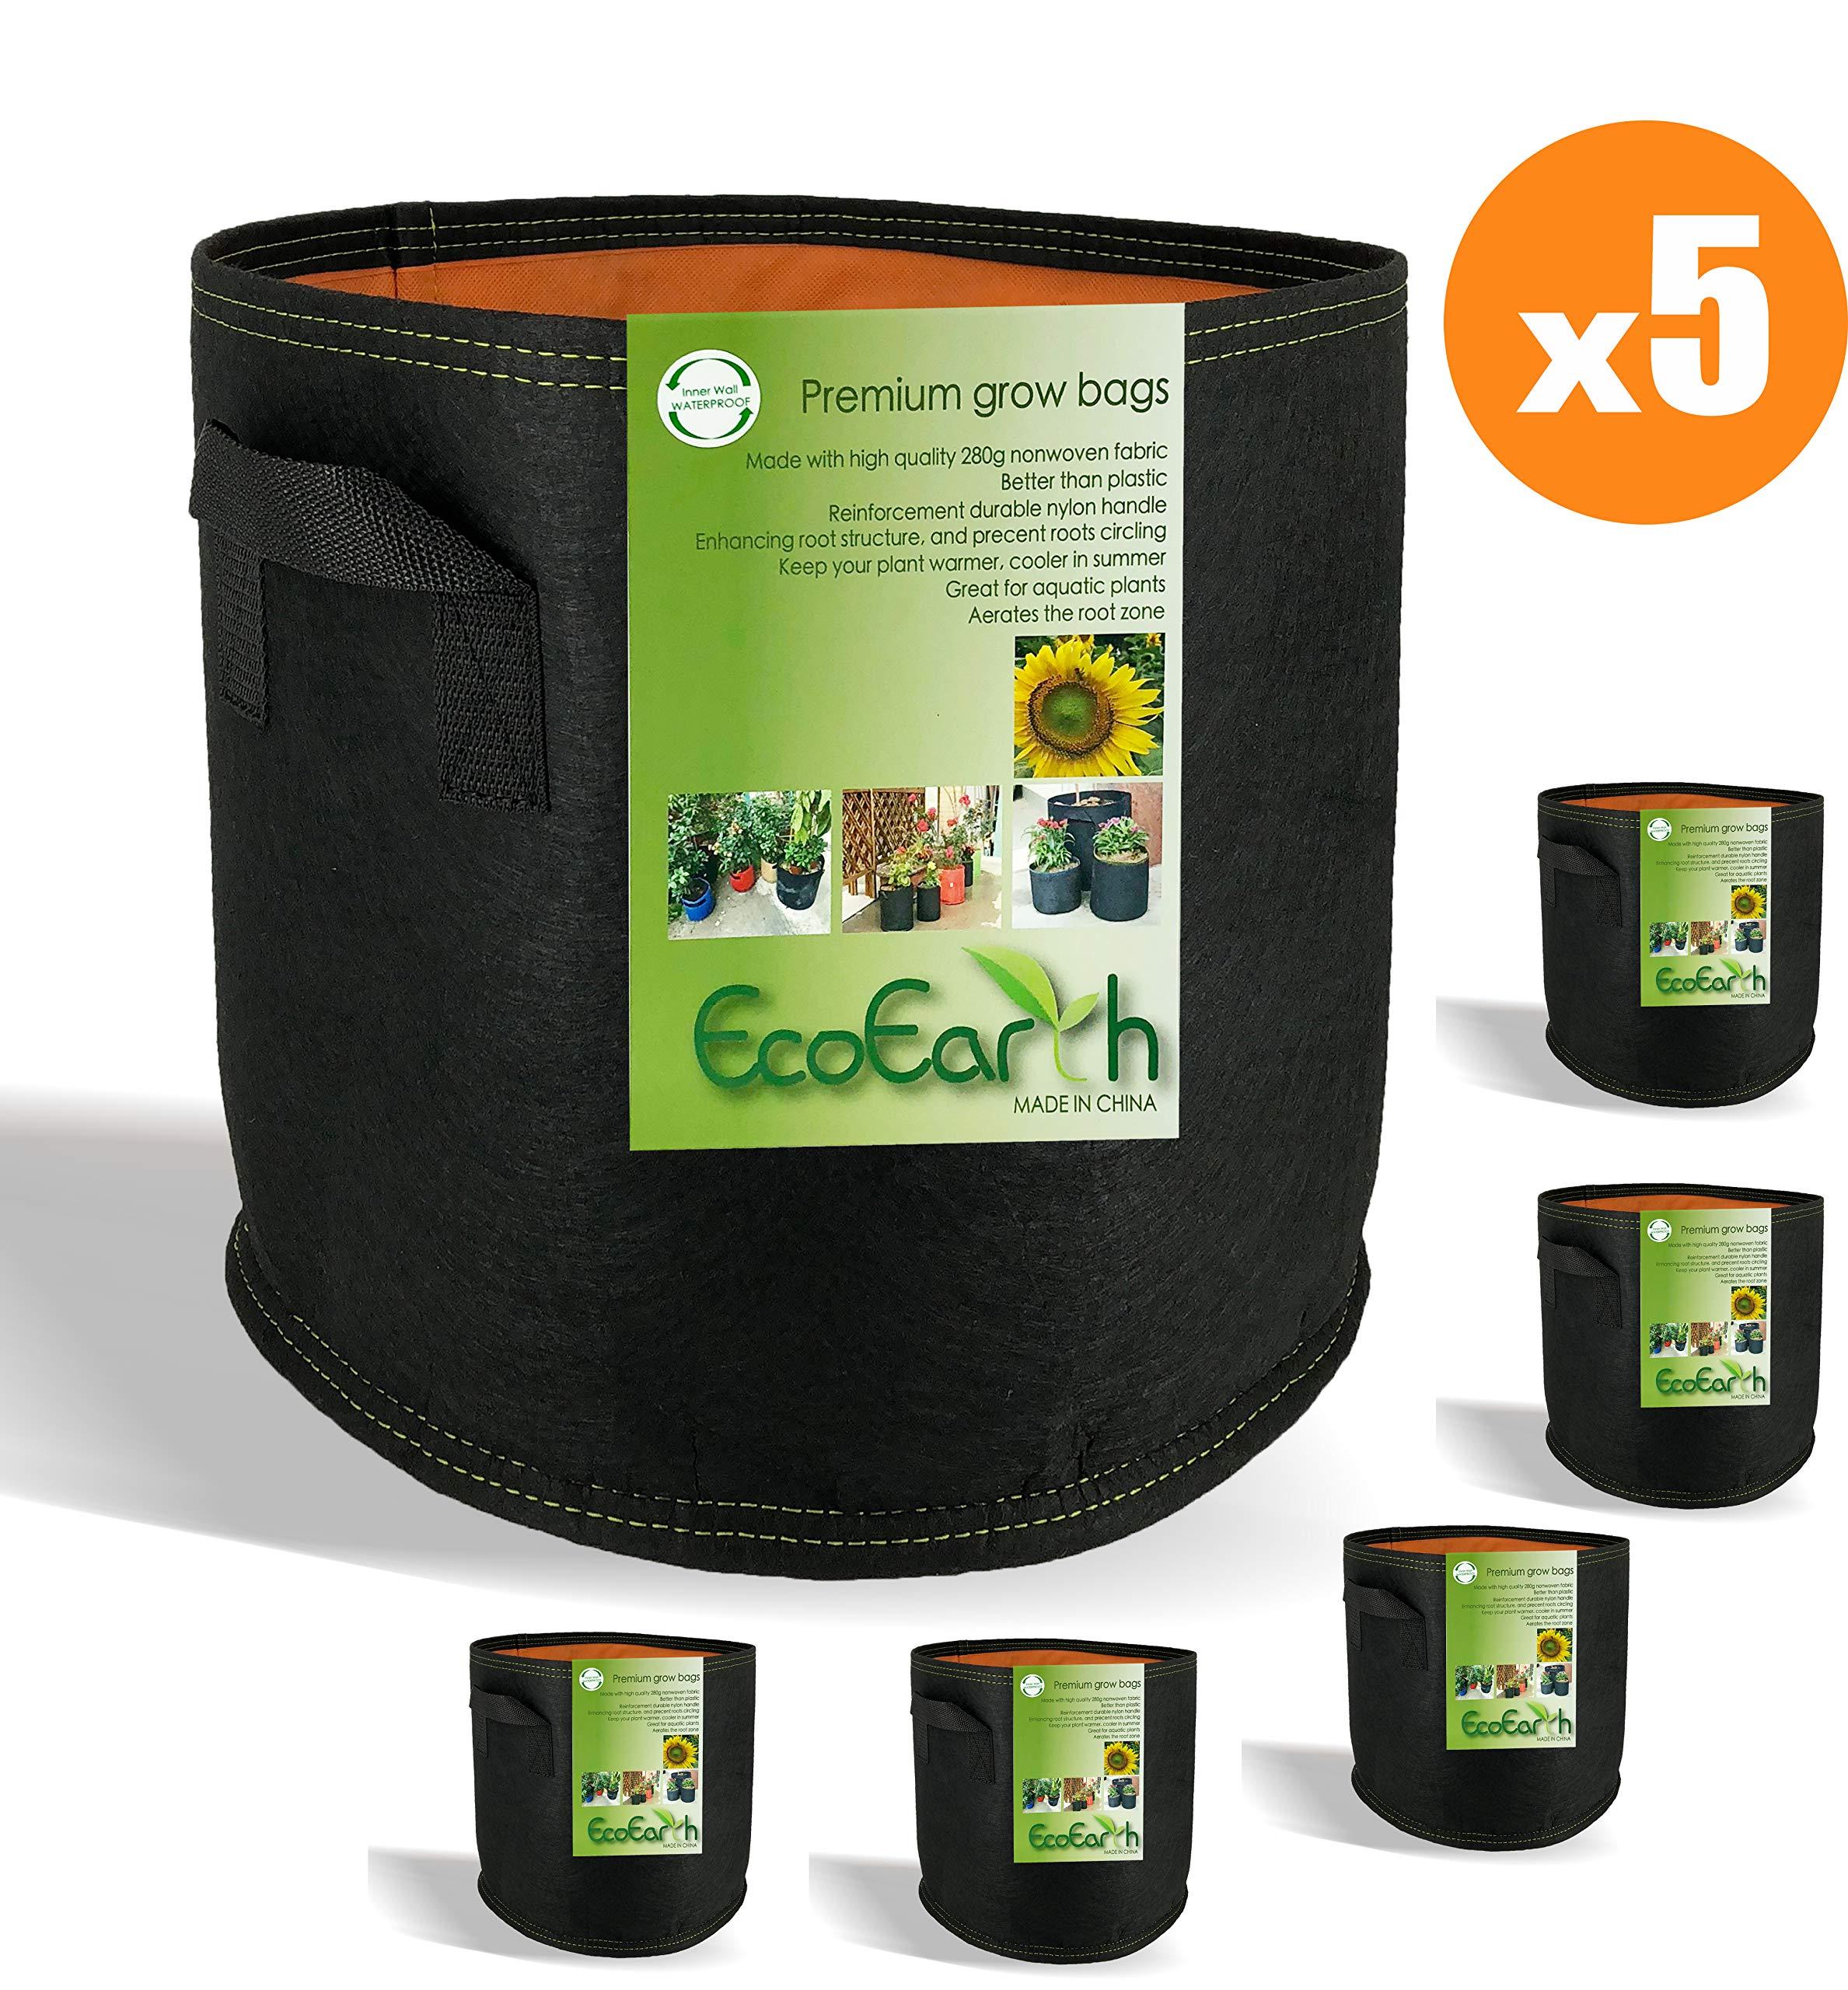 EcoEarth 7 Gallon Grow Bags (Premium Material 5 Pack) / Waterproof Side Wall/Grow Bags 7 Gallon/Fabric Pots with Handles/Nonwoven Grow Bag/Fabric Plant Pots/Growing Bag/Garden Planter Bag